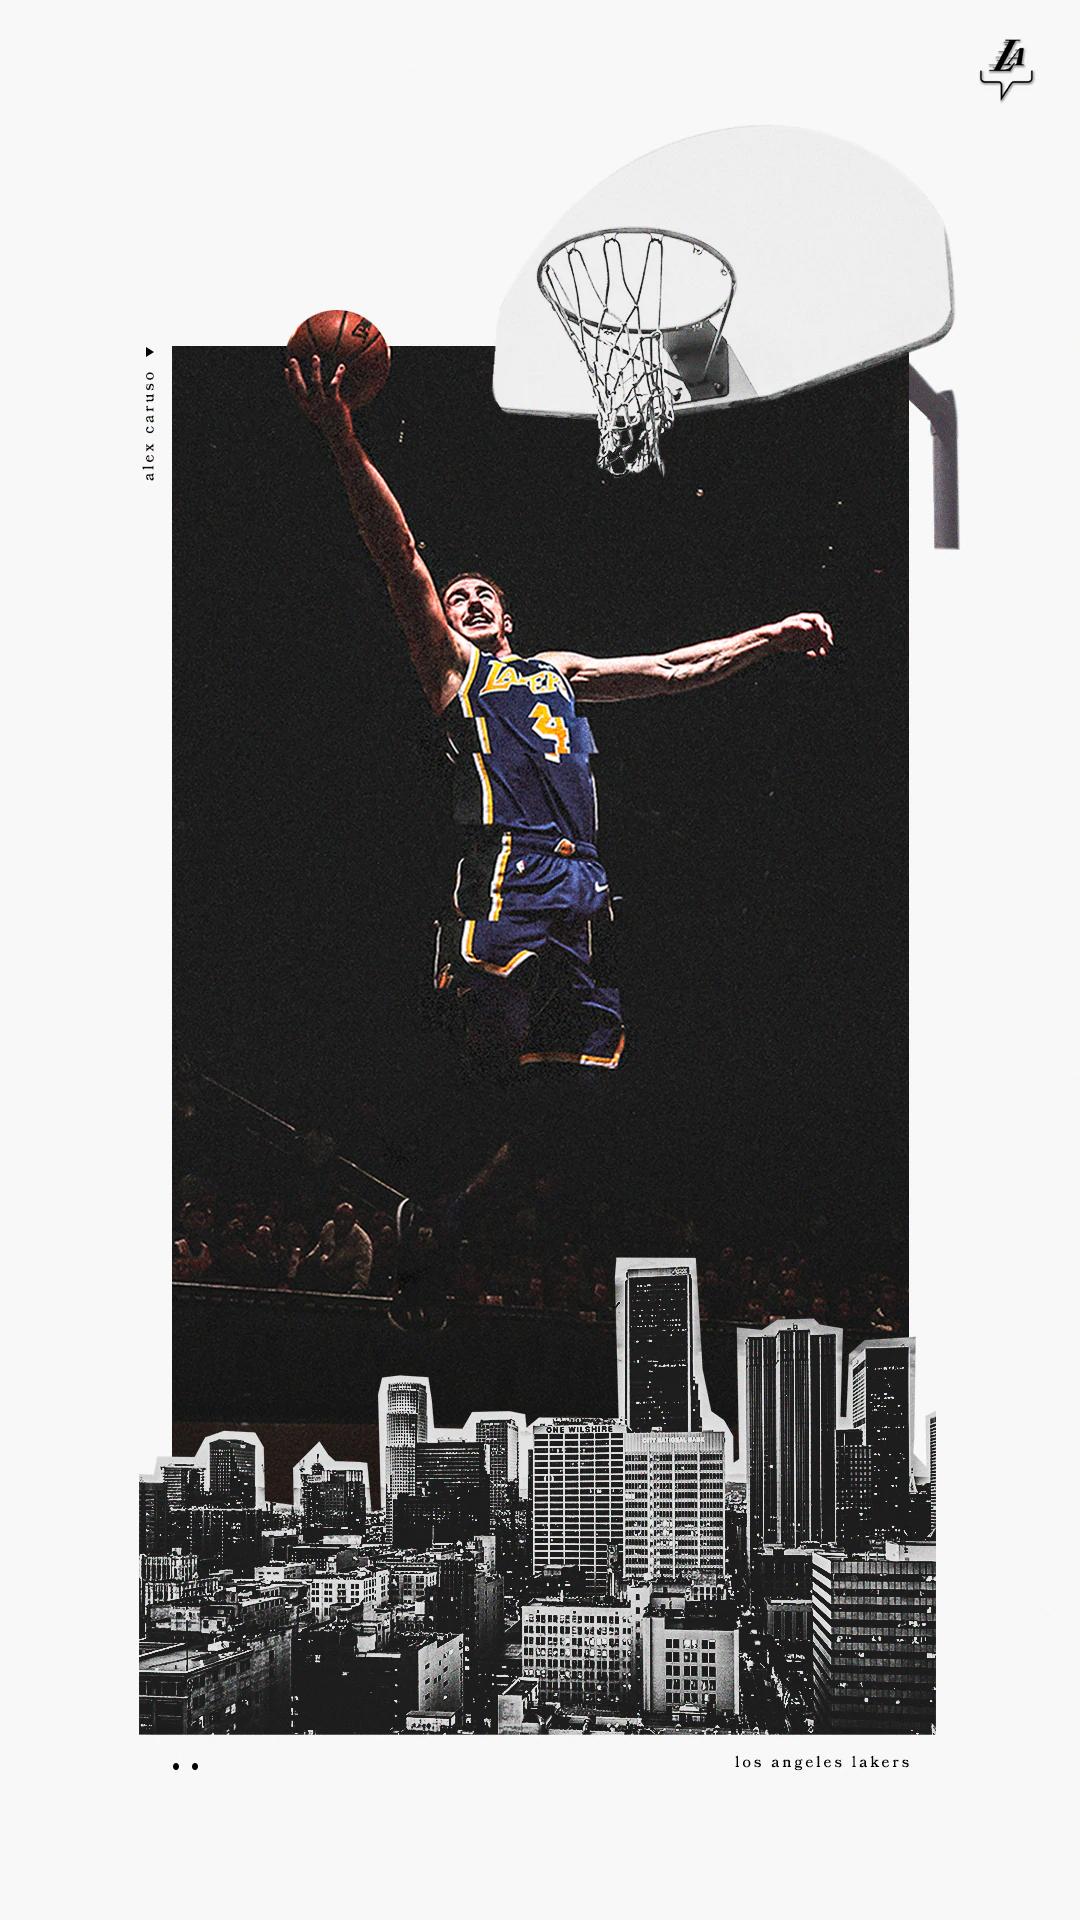 Alex Caruso Wallpaper In 2020 Lakers Wallpaper Sports Graphic Design Sports Posters Basketball